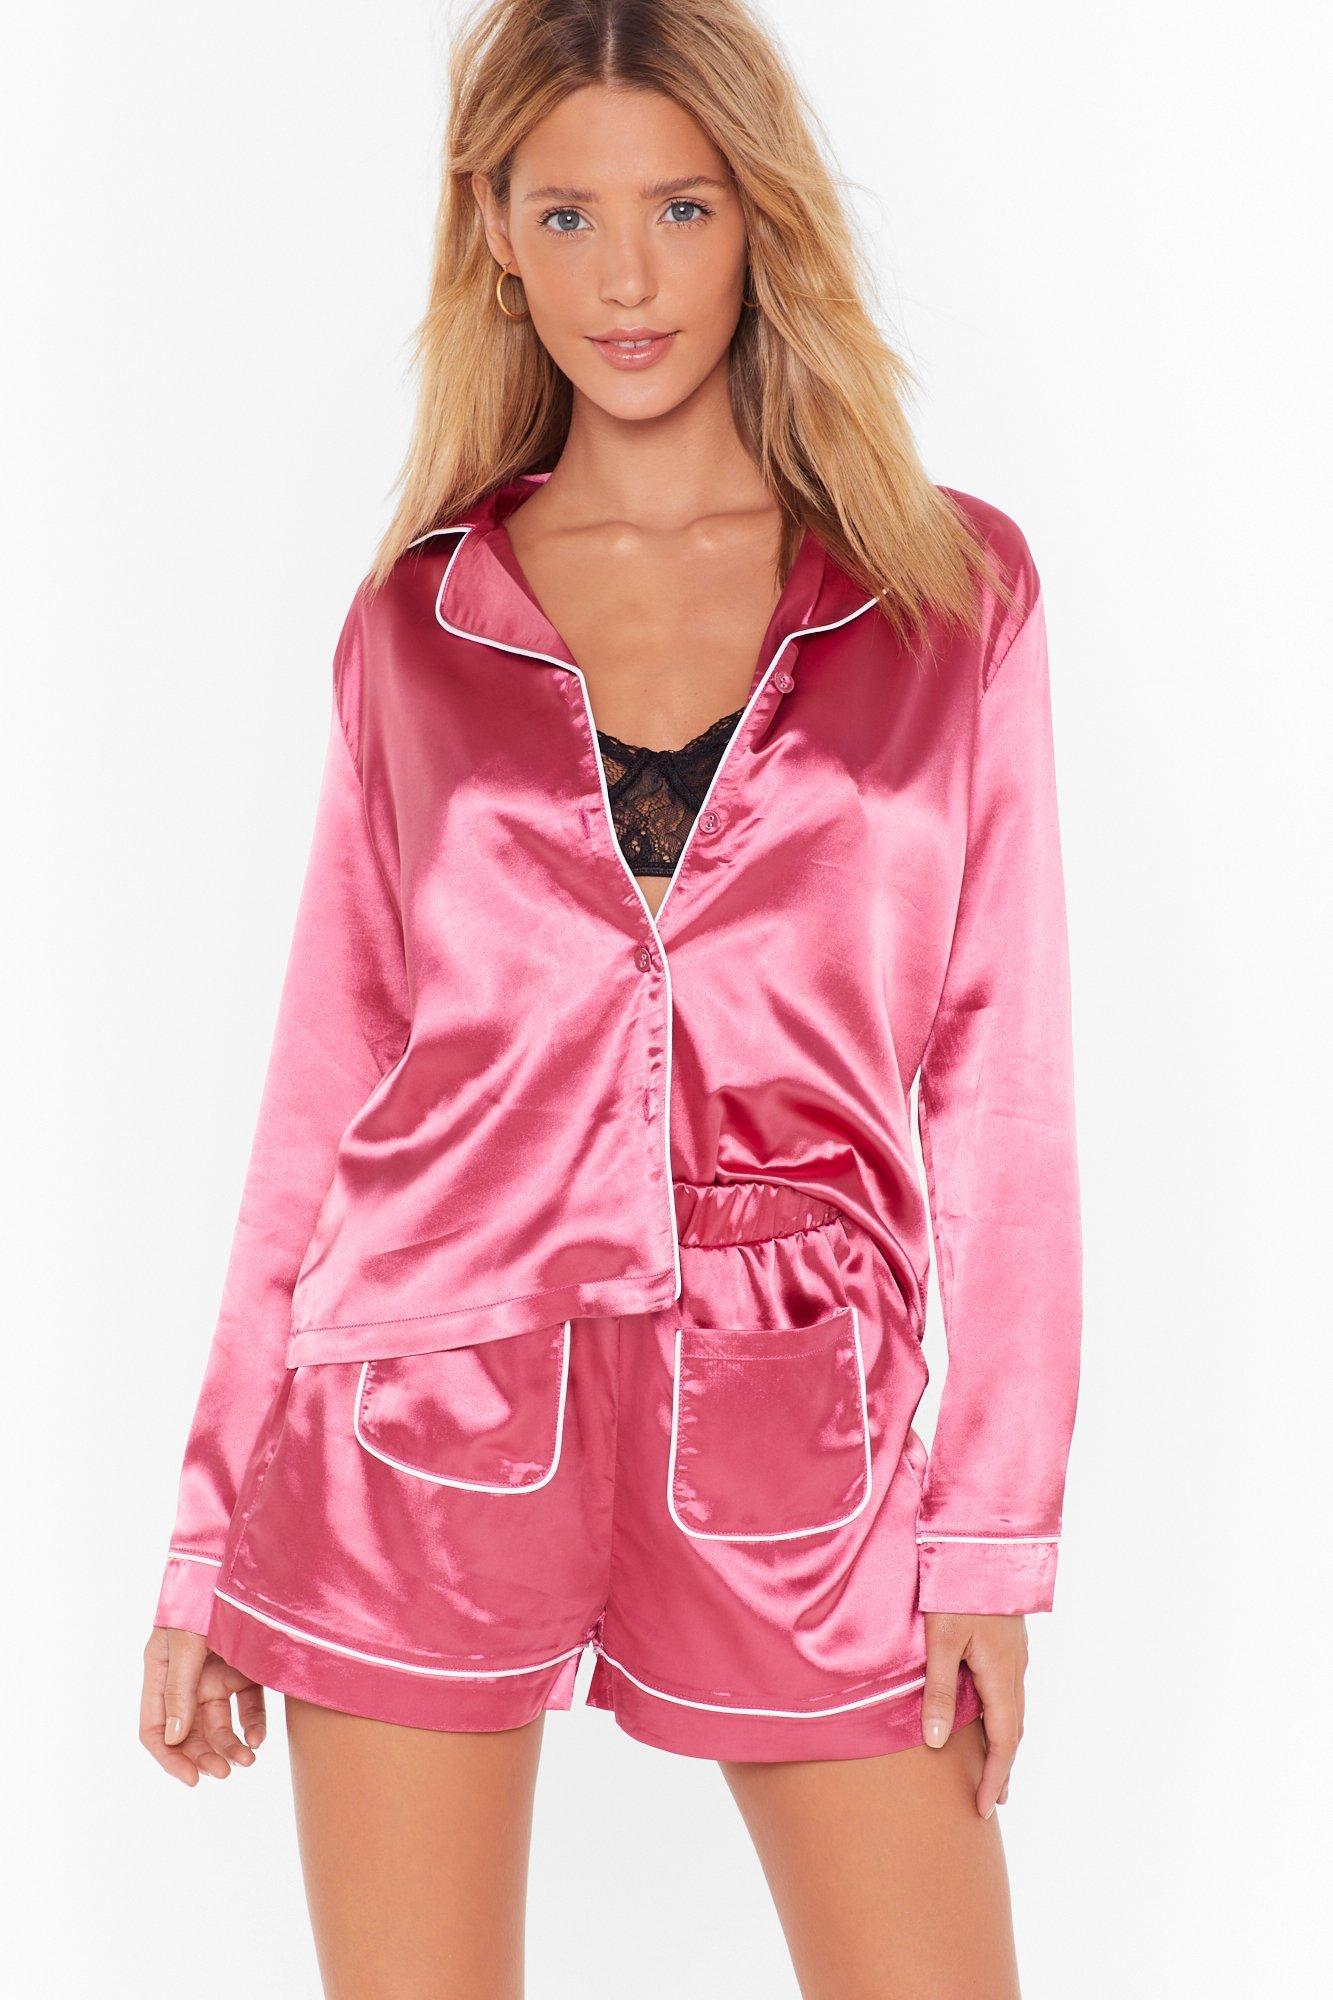 Image of Goodnight Sleek Tight Satin Pajama Shorts Set